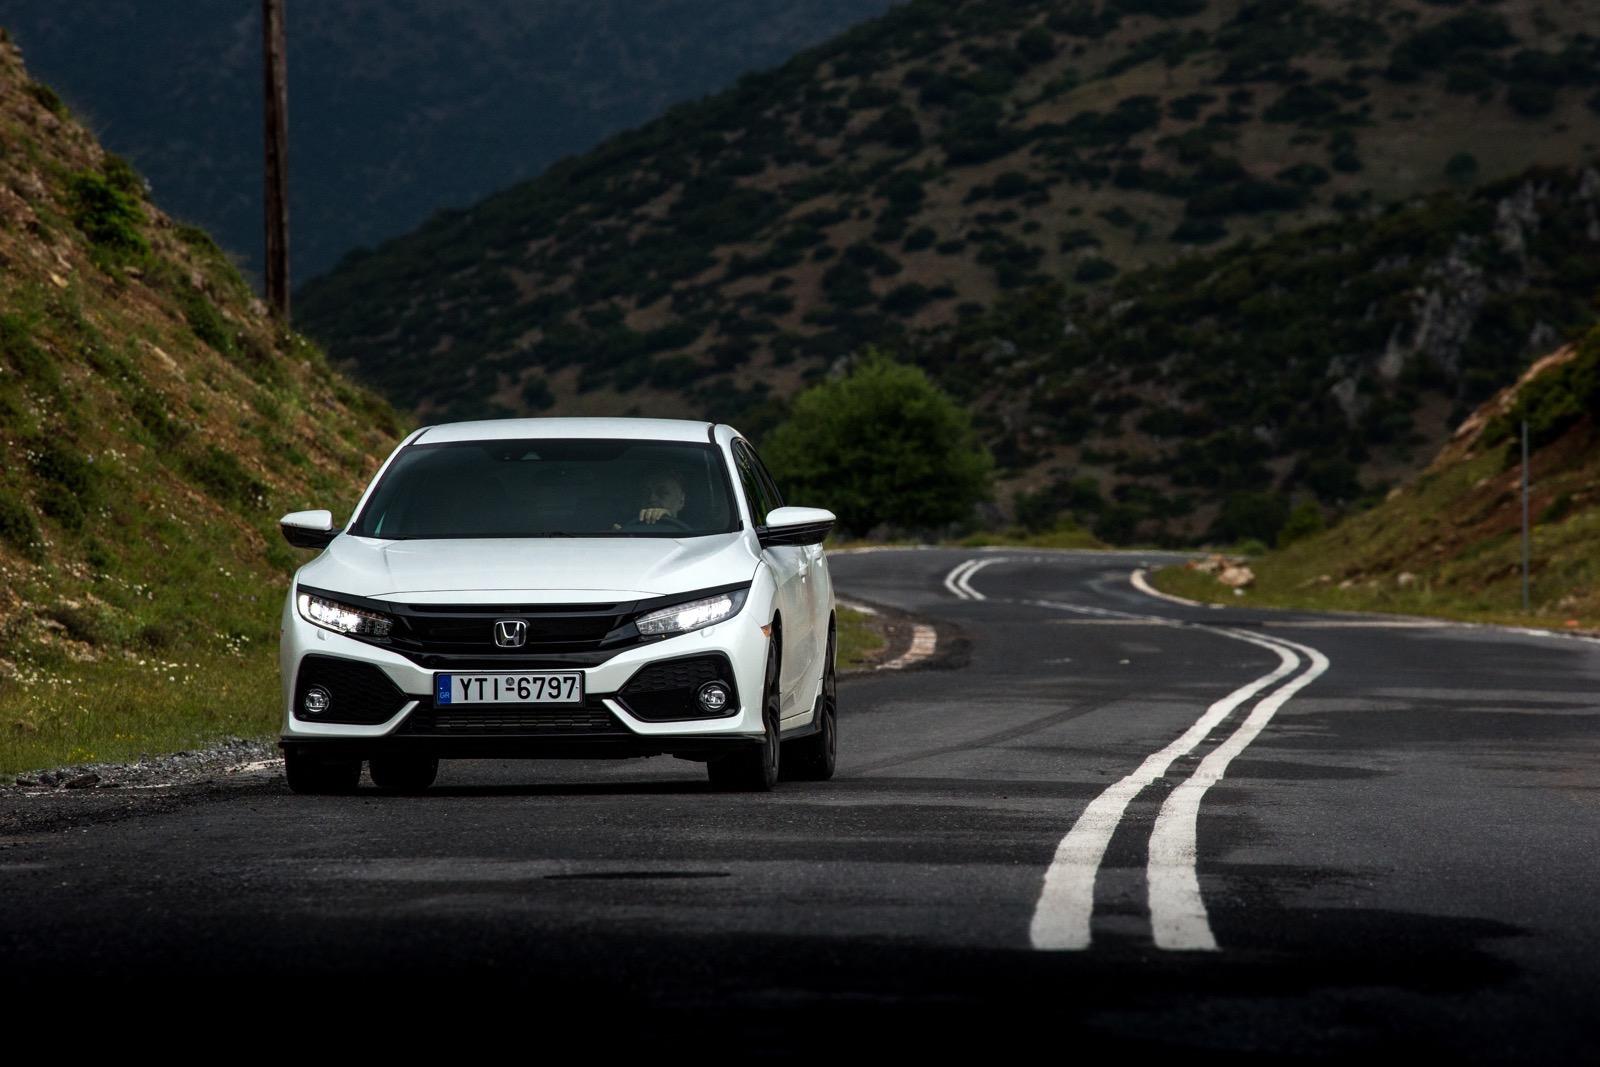 New_Honda_Civic_First_Drive_172